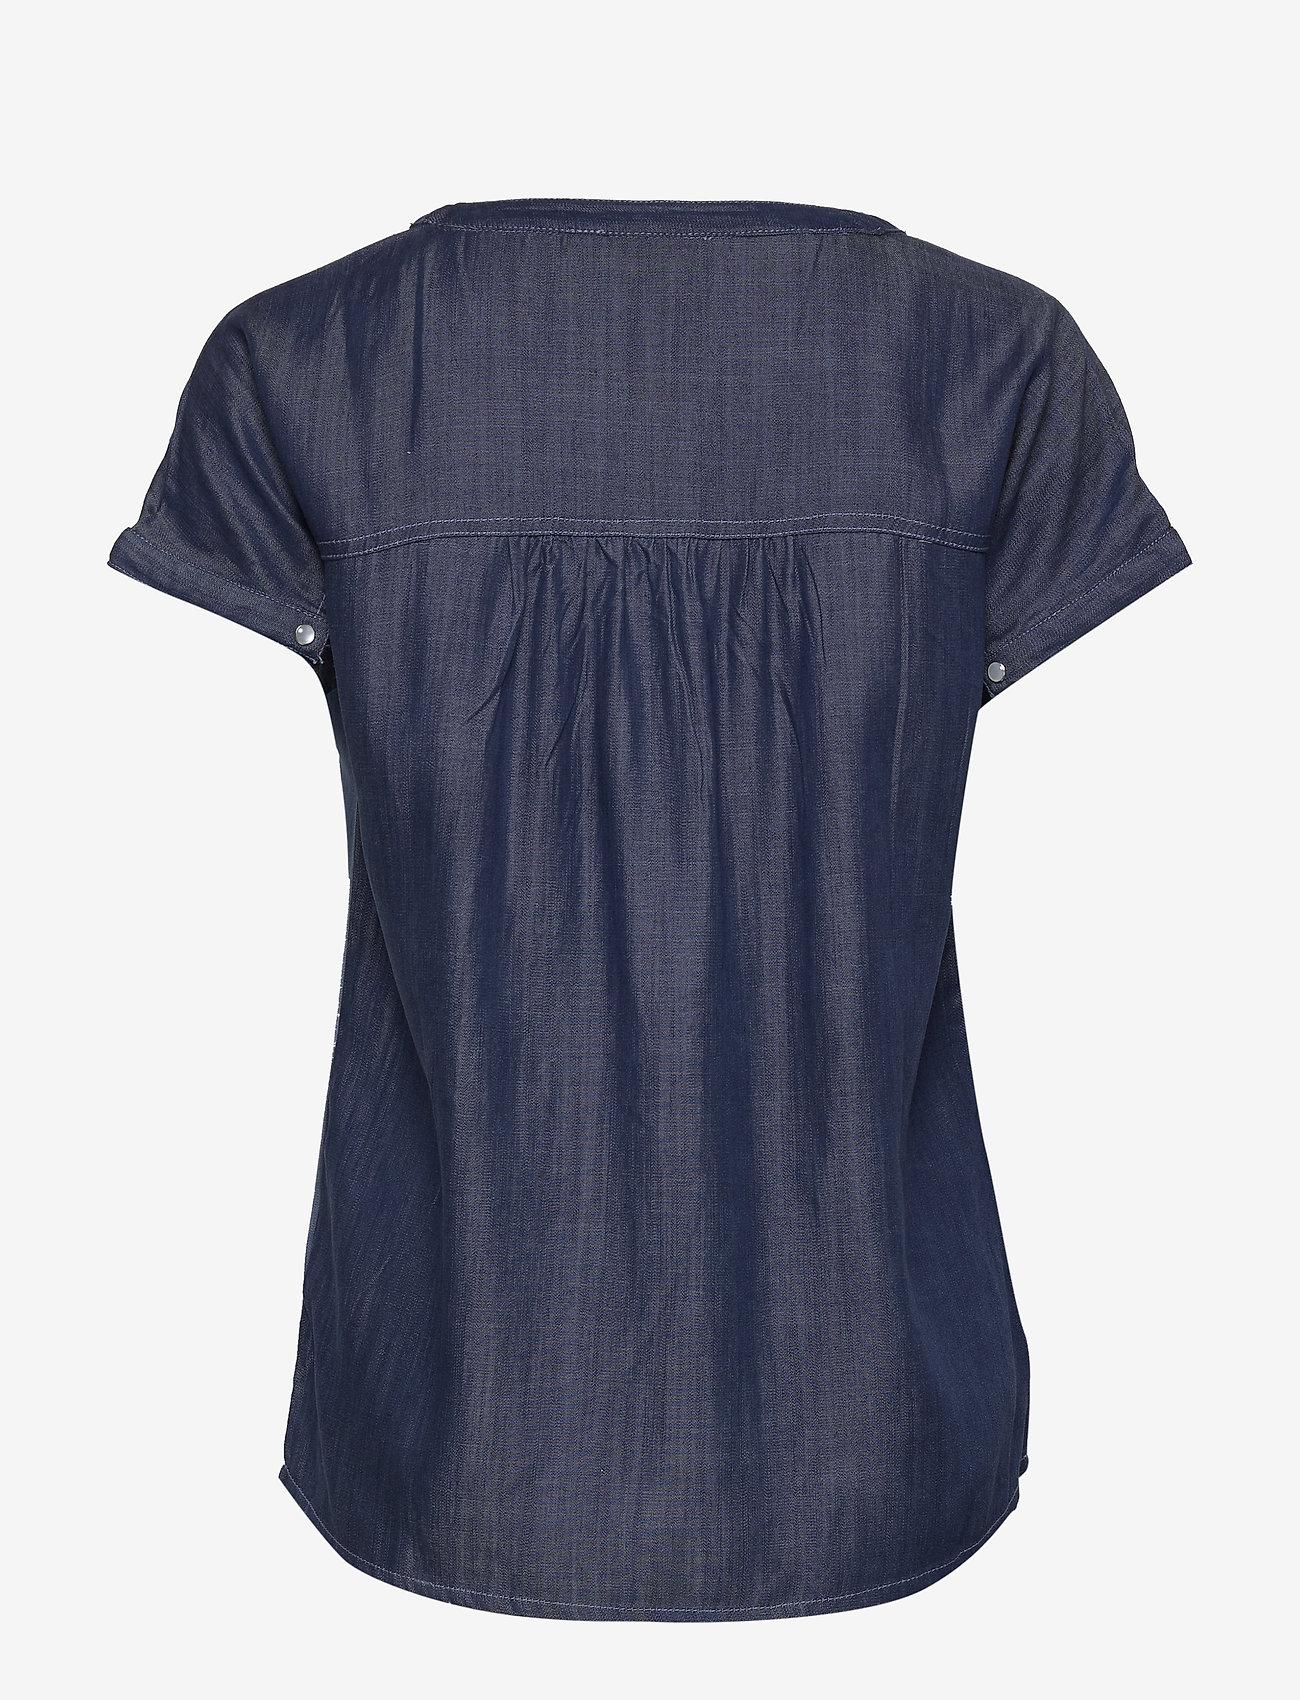 Brandtex Blouse-woven - Blouses & Shirts